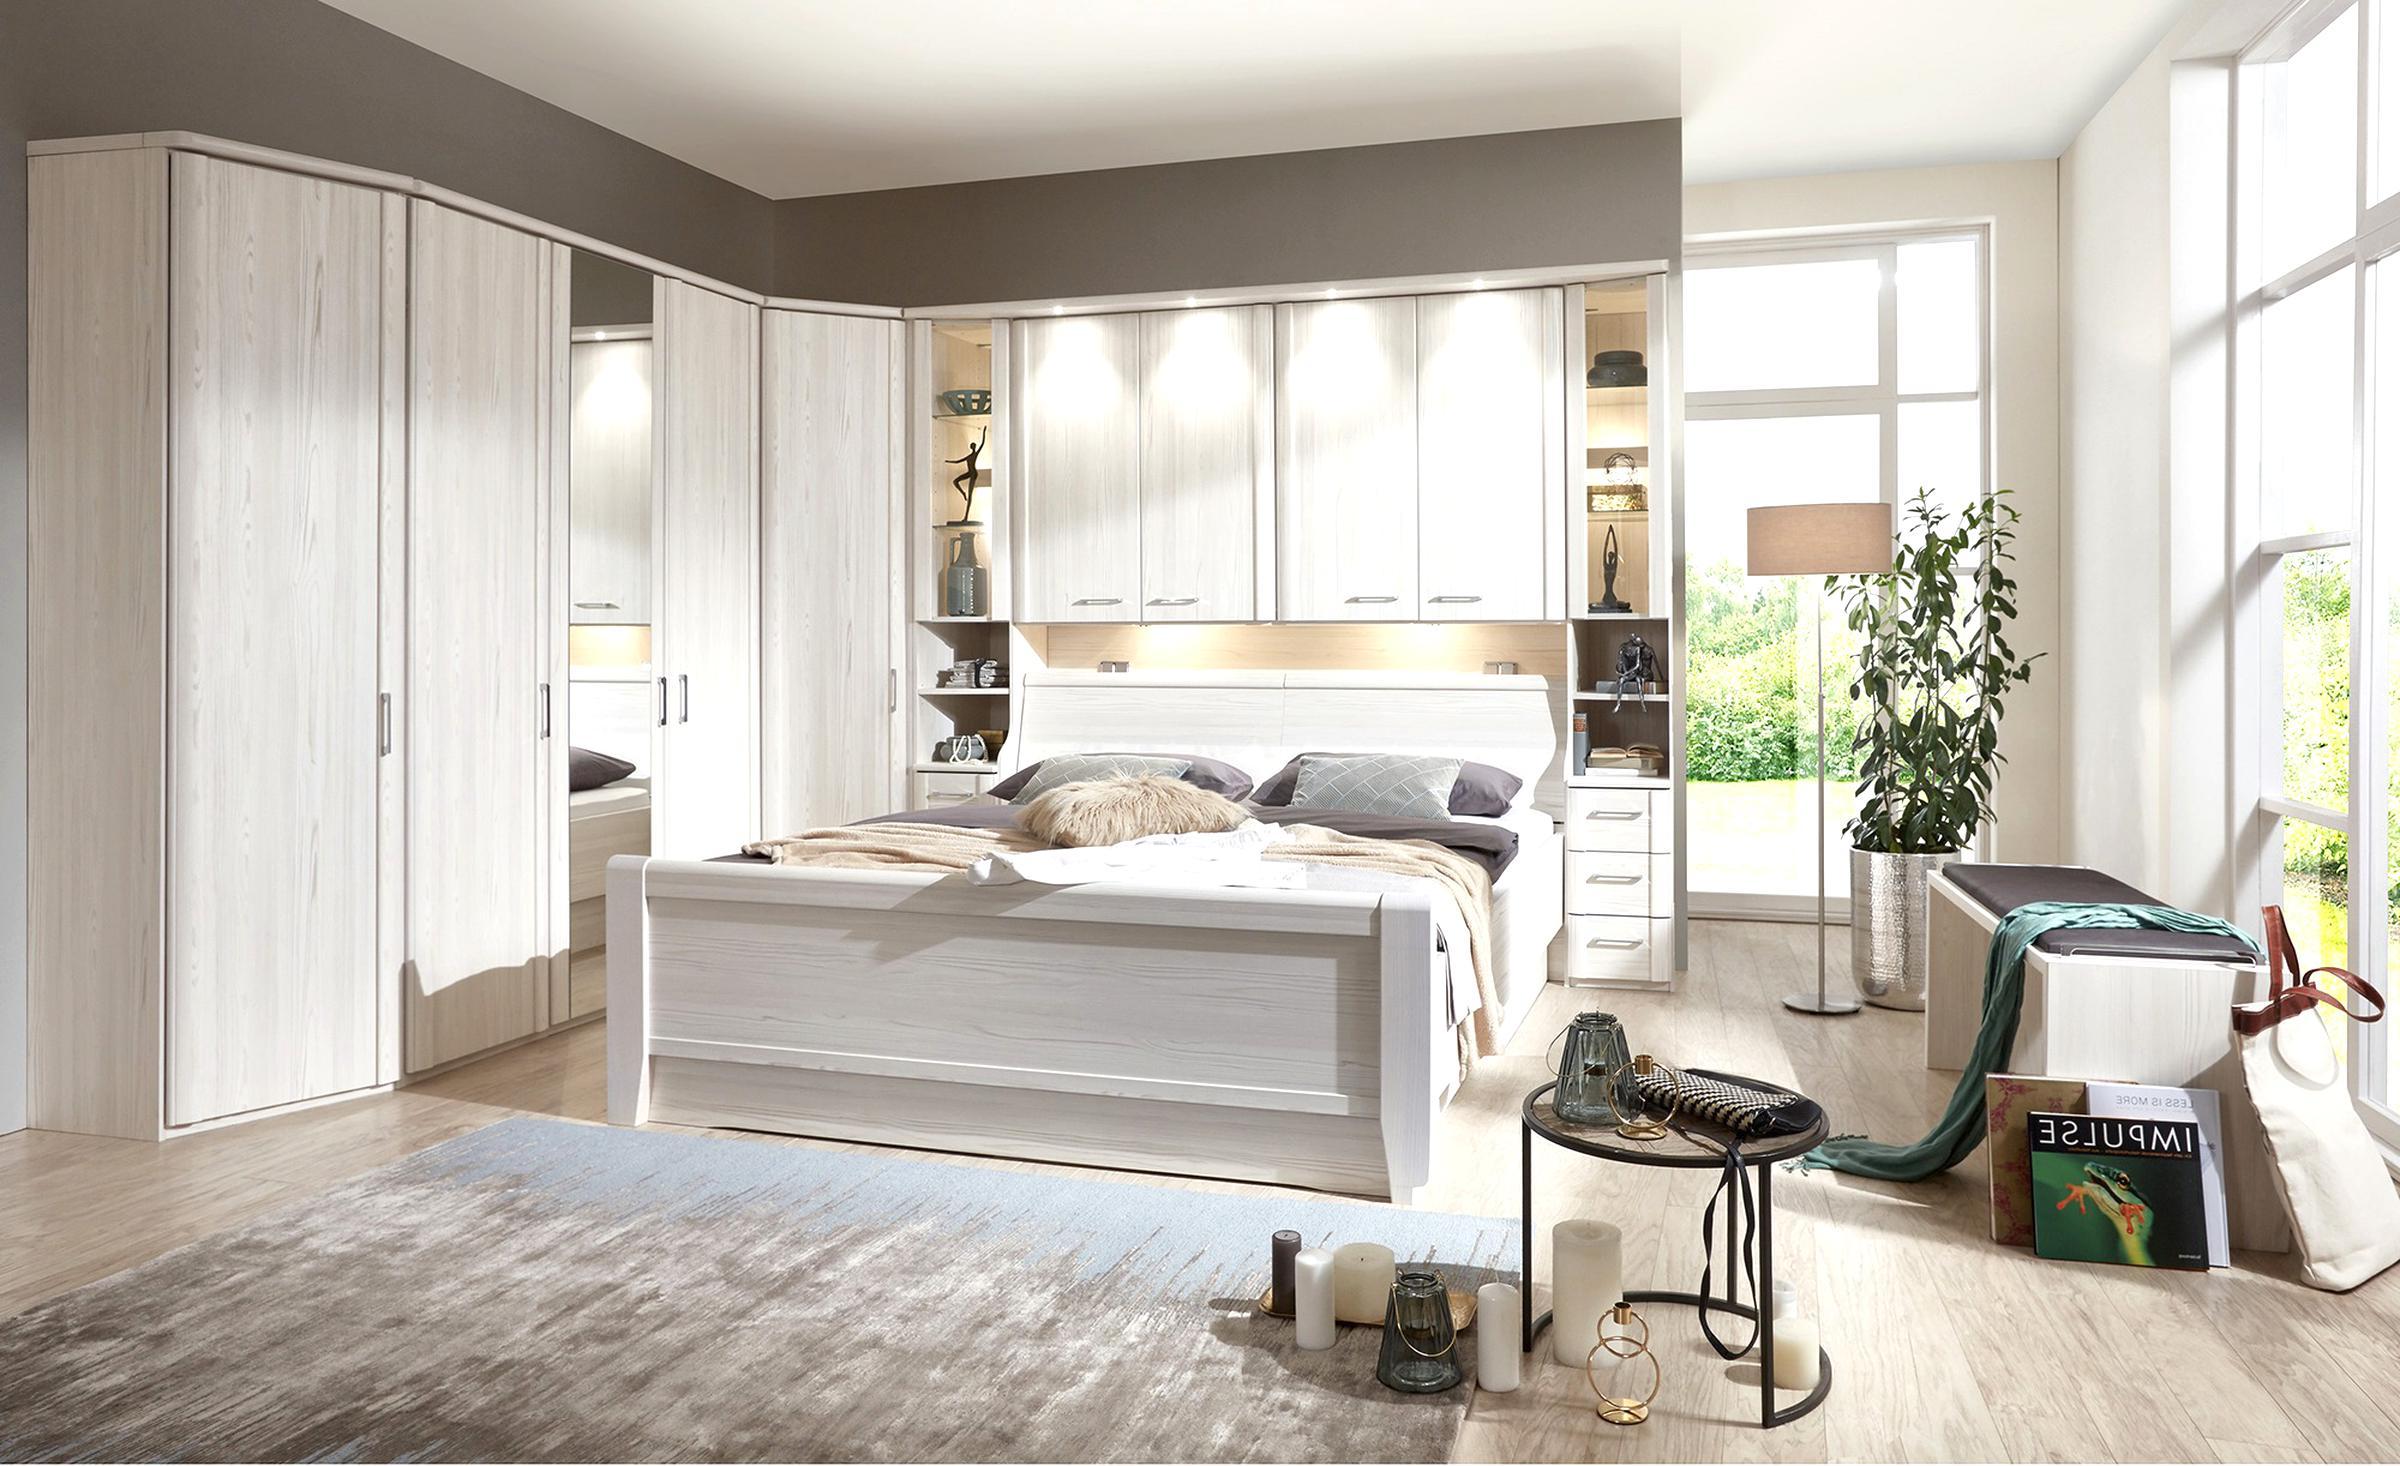 schlafzimmer komplett massivholz honigfarben wenig